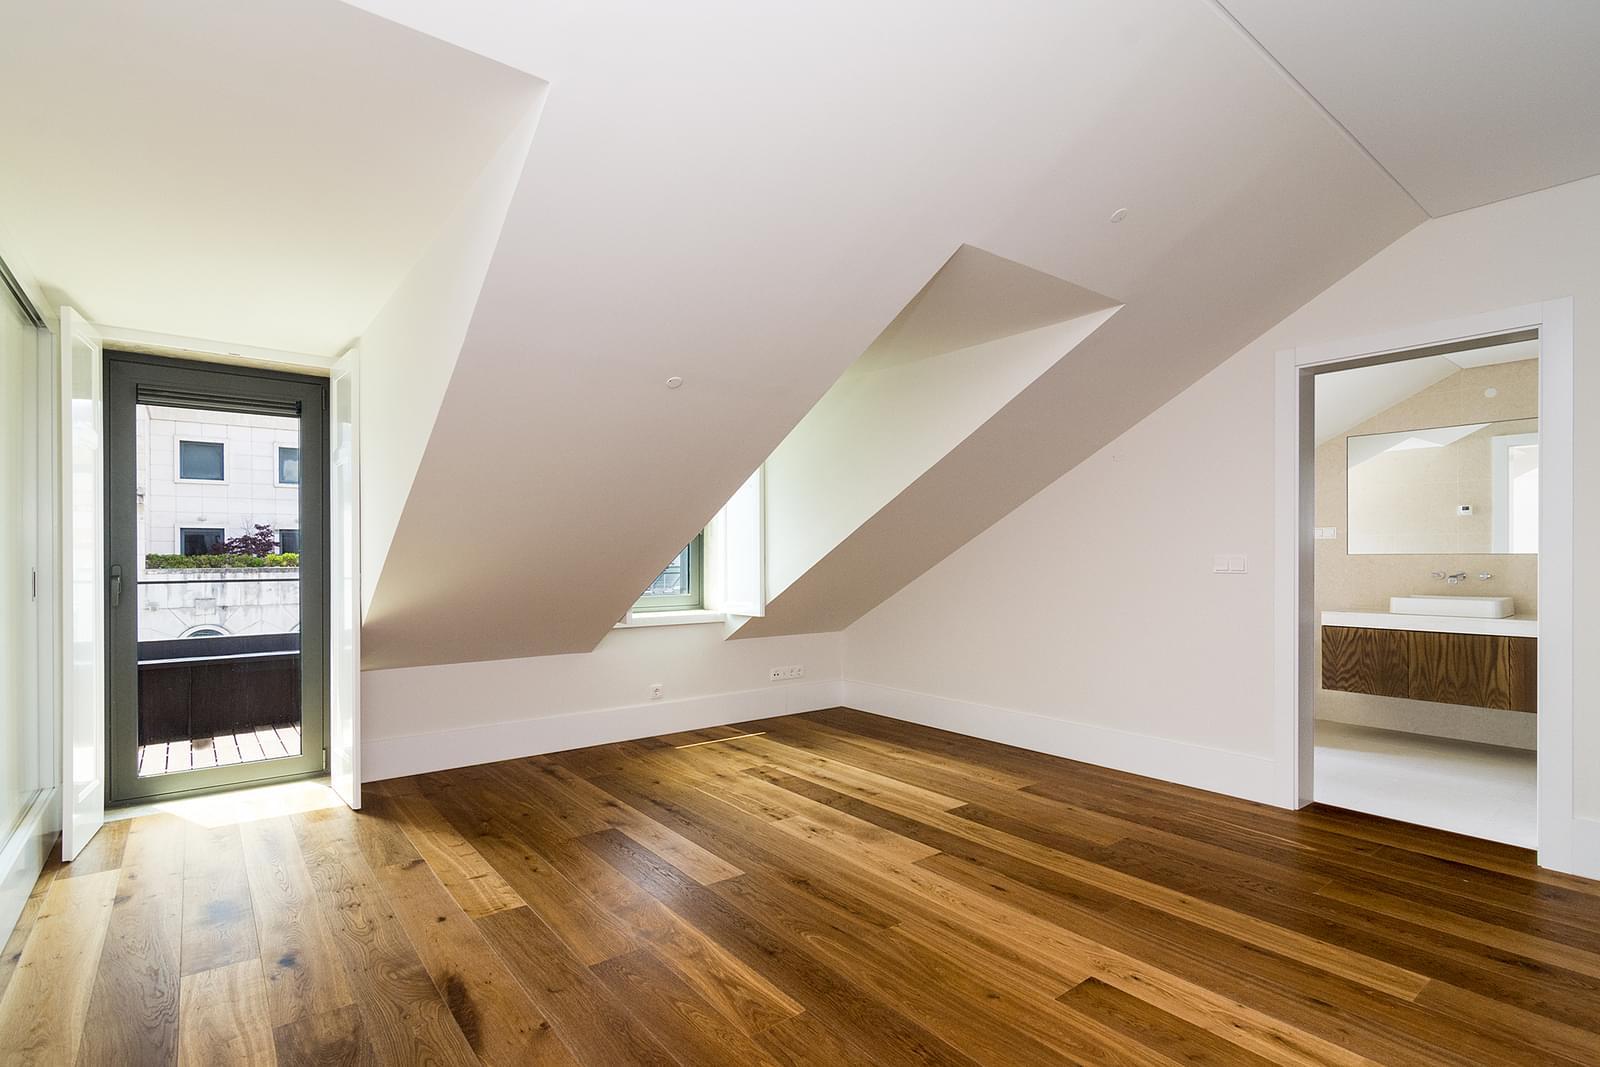 pf17442-apartamento-t3-lisboa-82e304ca-324b-4b25-abac-43dab5f97d8e